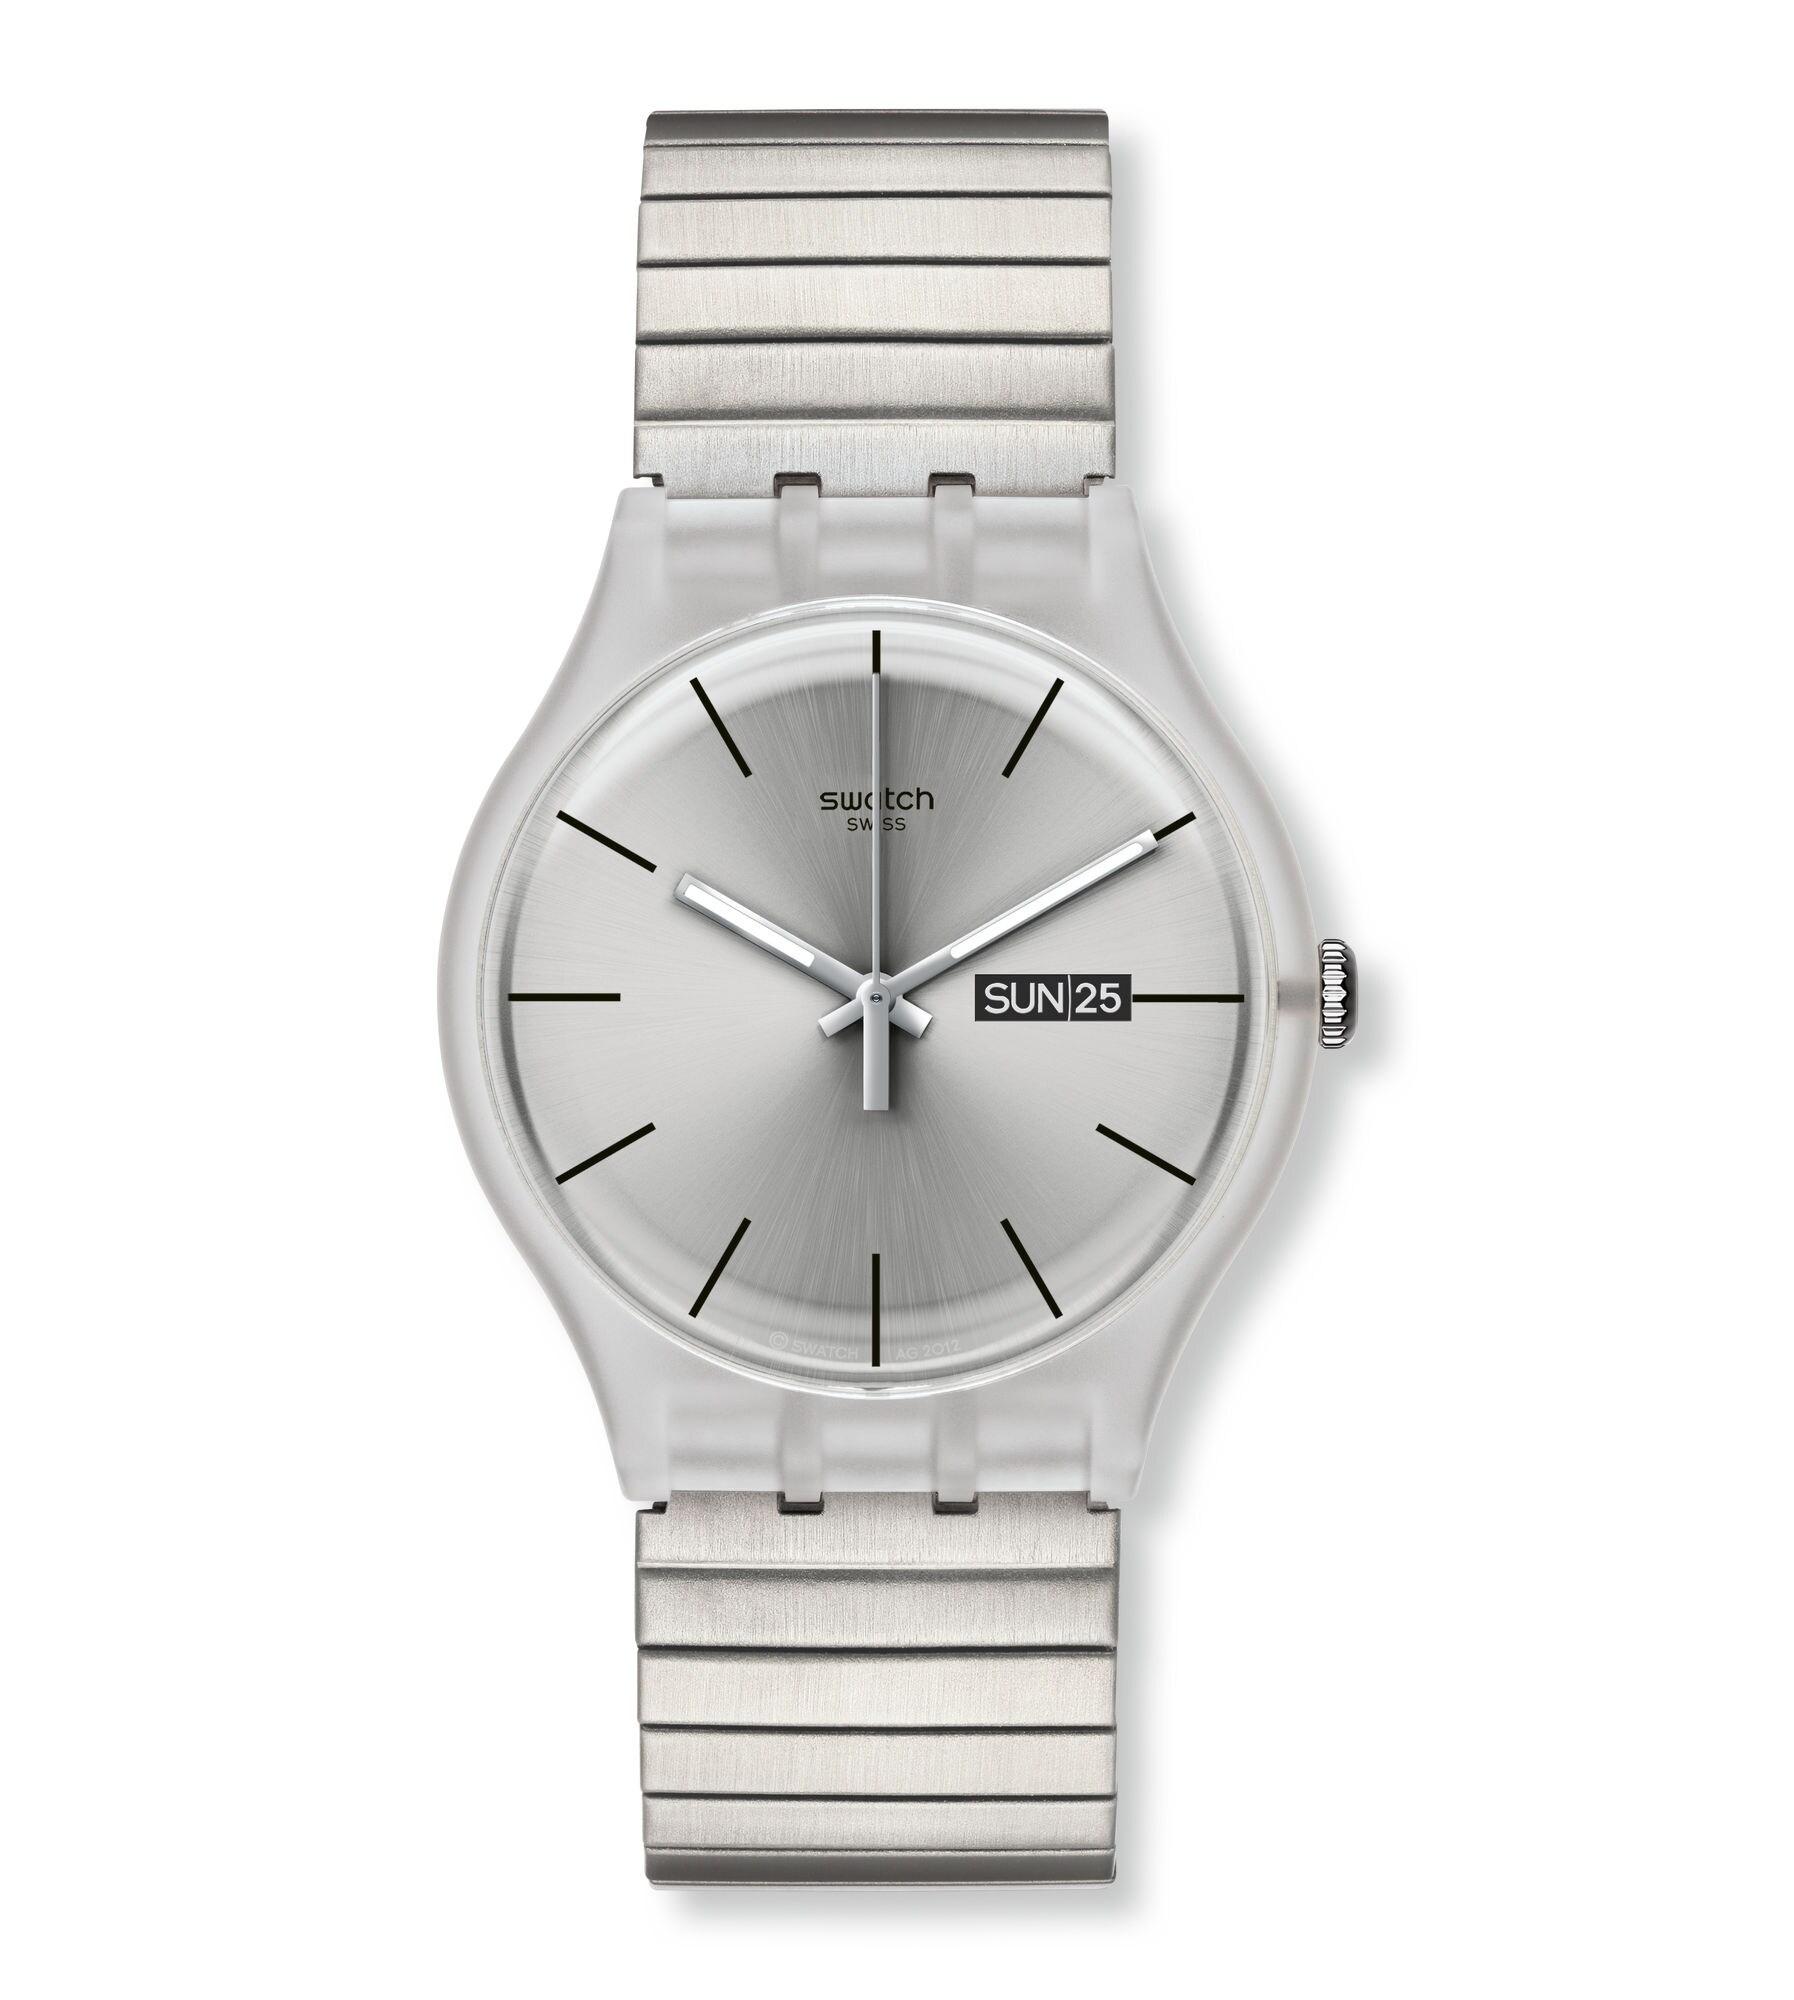 Swatch Swatch Swatch Cepillado Cepillado Swatch Cepillado Reloj Cepillado Cepillado Reloj Swatch Reloj Reloj Reloj Reloj DHY9IE2W